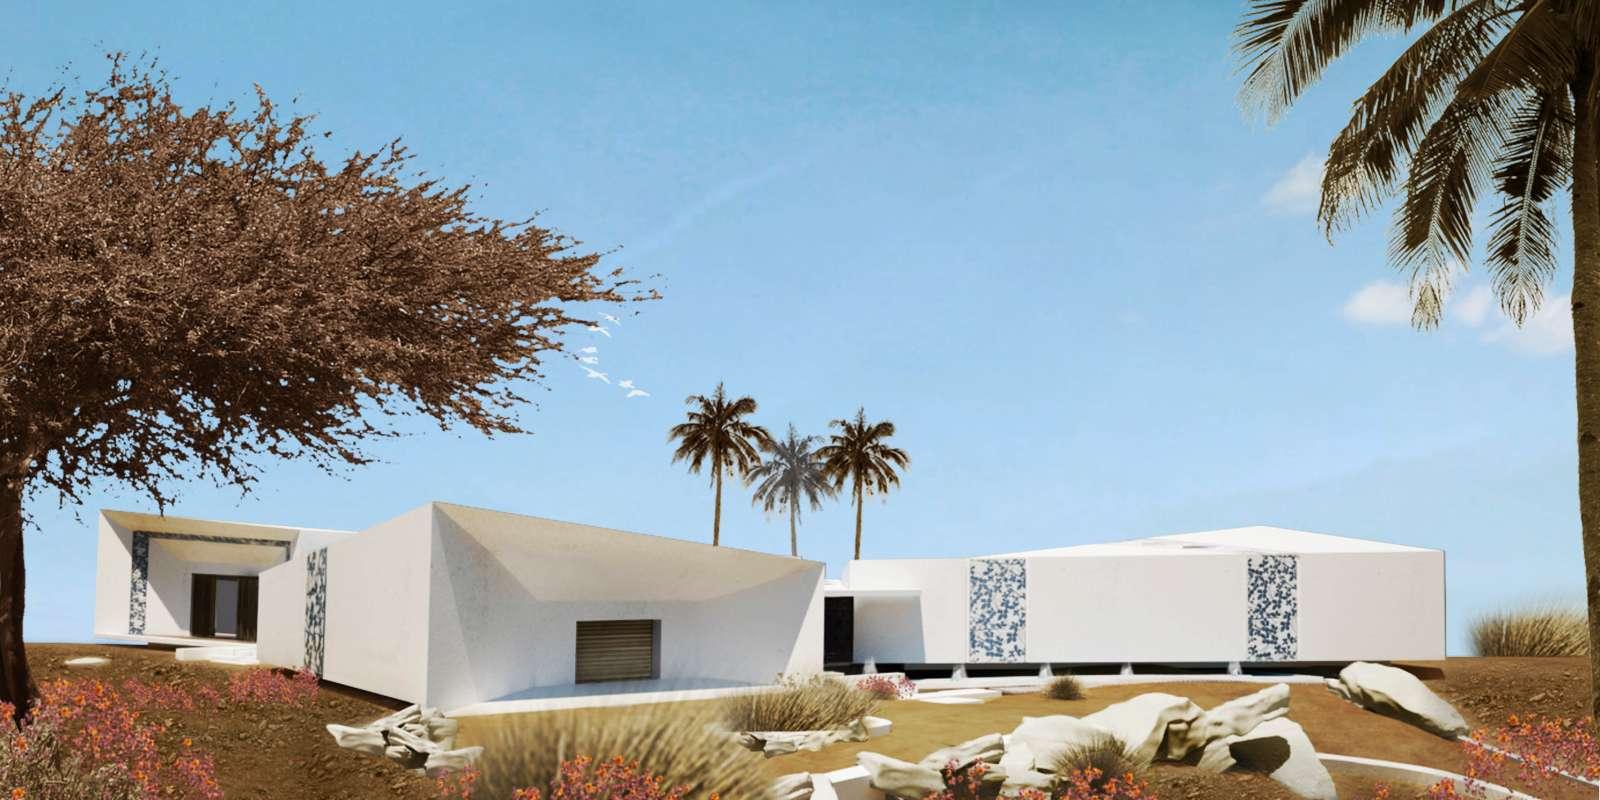 03-Alkhozama-Desert-Casa-de-Ark-Kassam-Arquitectos